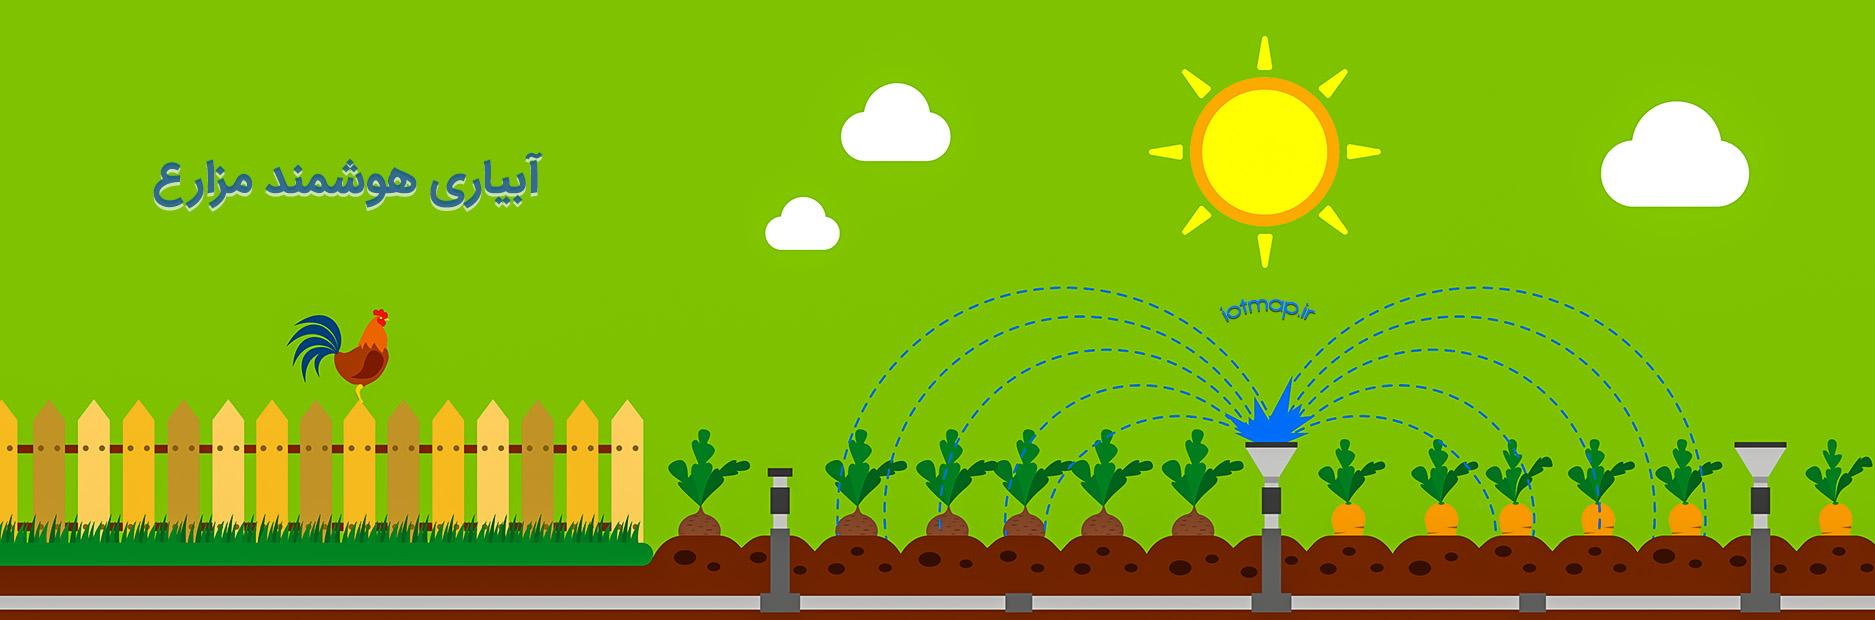 آبیاری مزارع